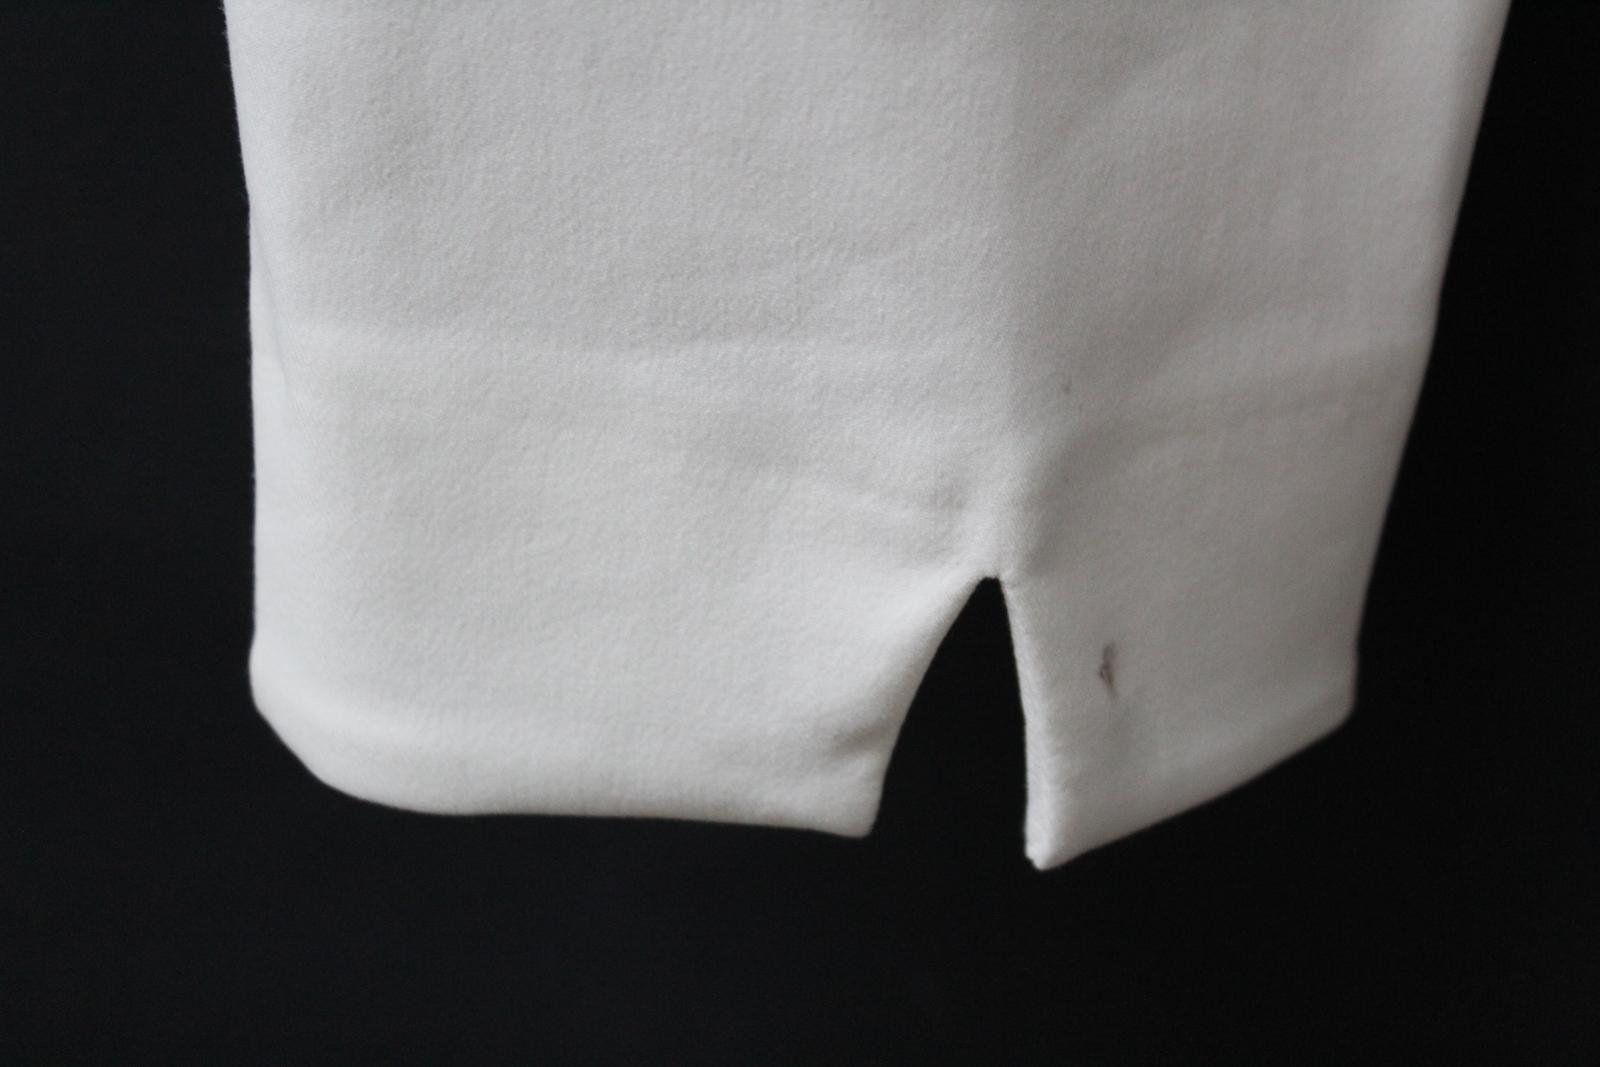 Costa-Damas-Marfil-Alexa-Algodon-Mezcla-recortada-High-rise-Pantalones-Cremallera-Lateral-UK14 miniatura 11